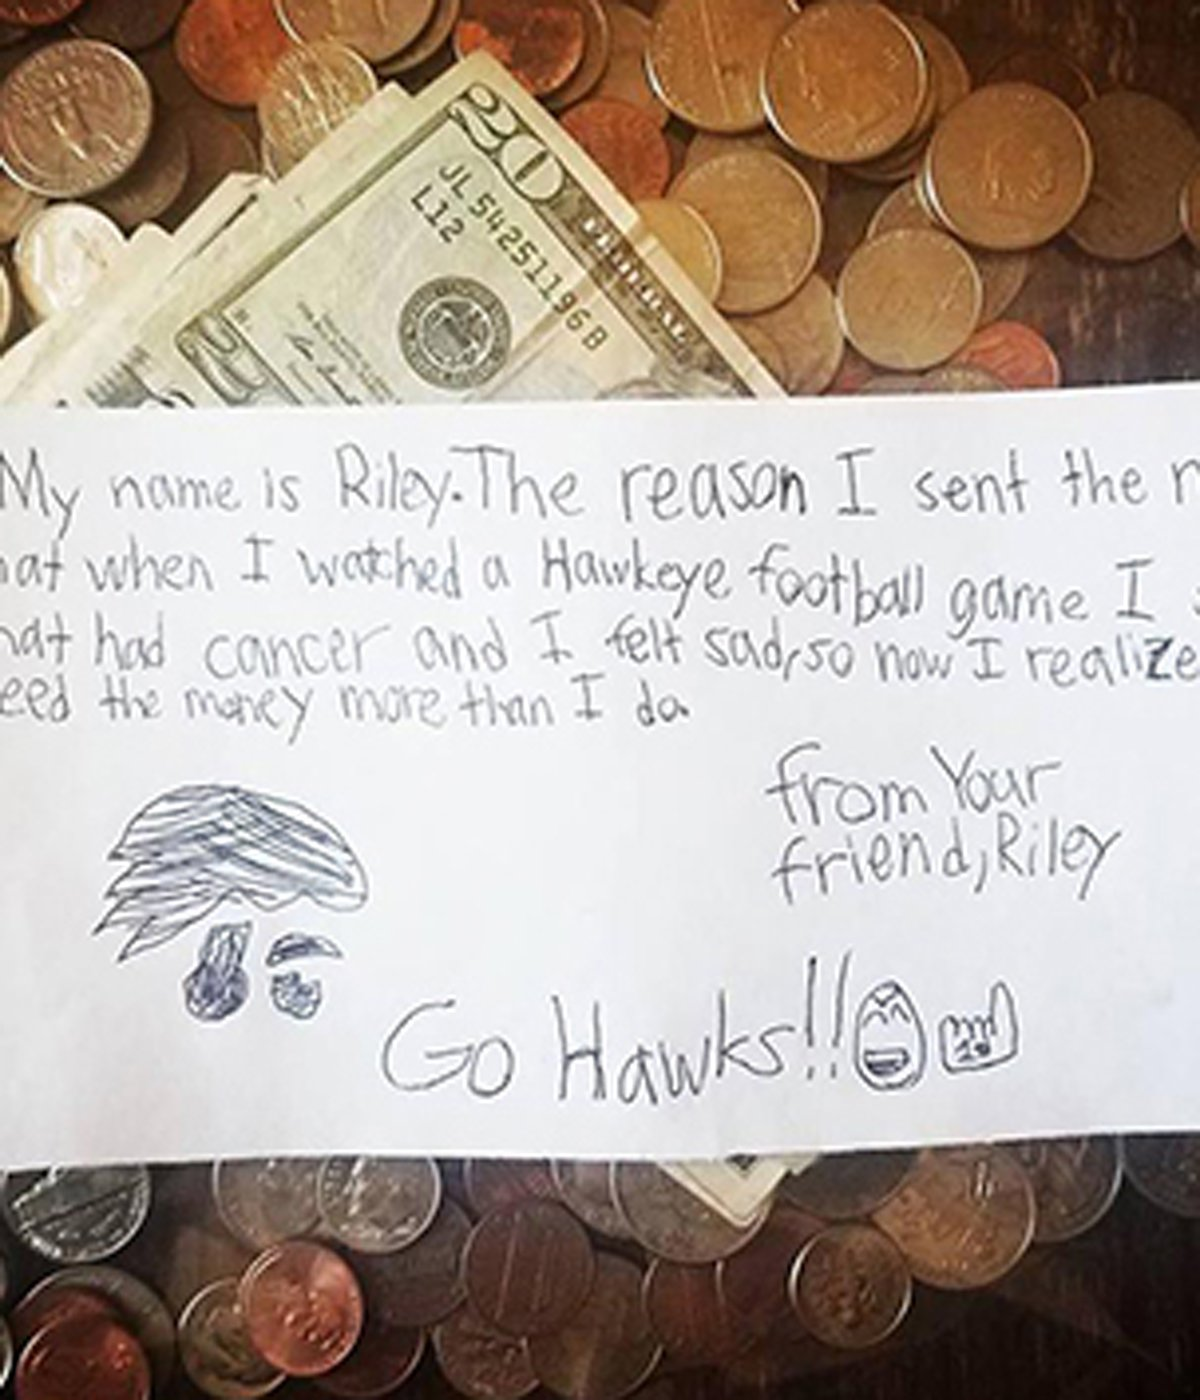 9-year-old donates life savings to help sick kids #FoxNewsUS (via @christocarbone) https://t.co/r6cWjoYsD9 https://t.co/YjAcF086LR